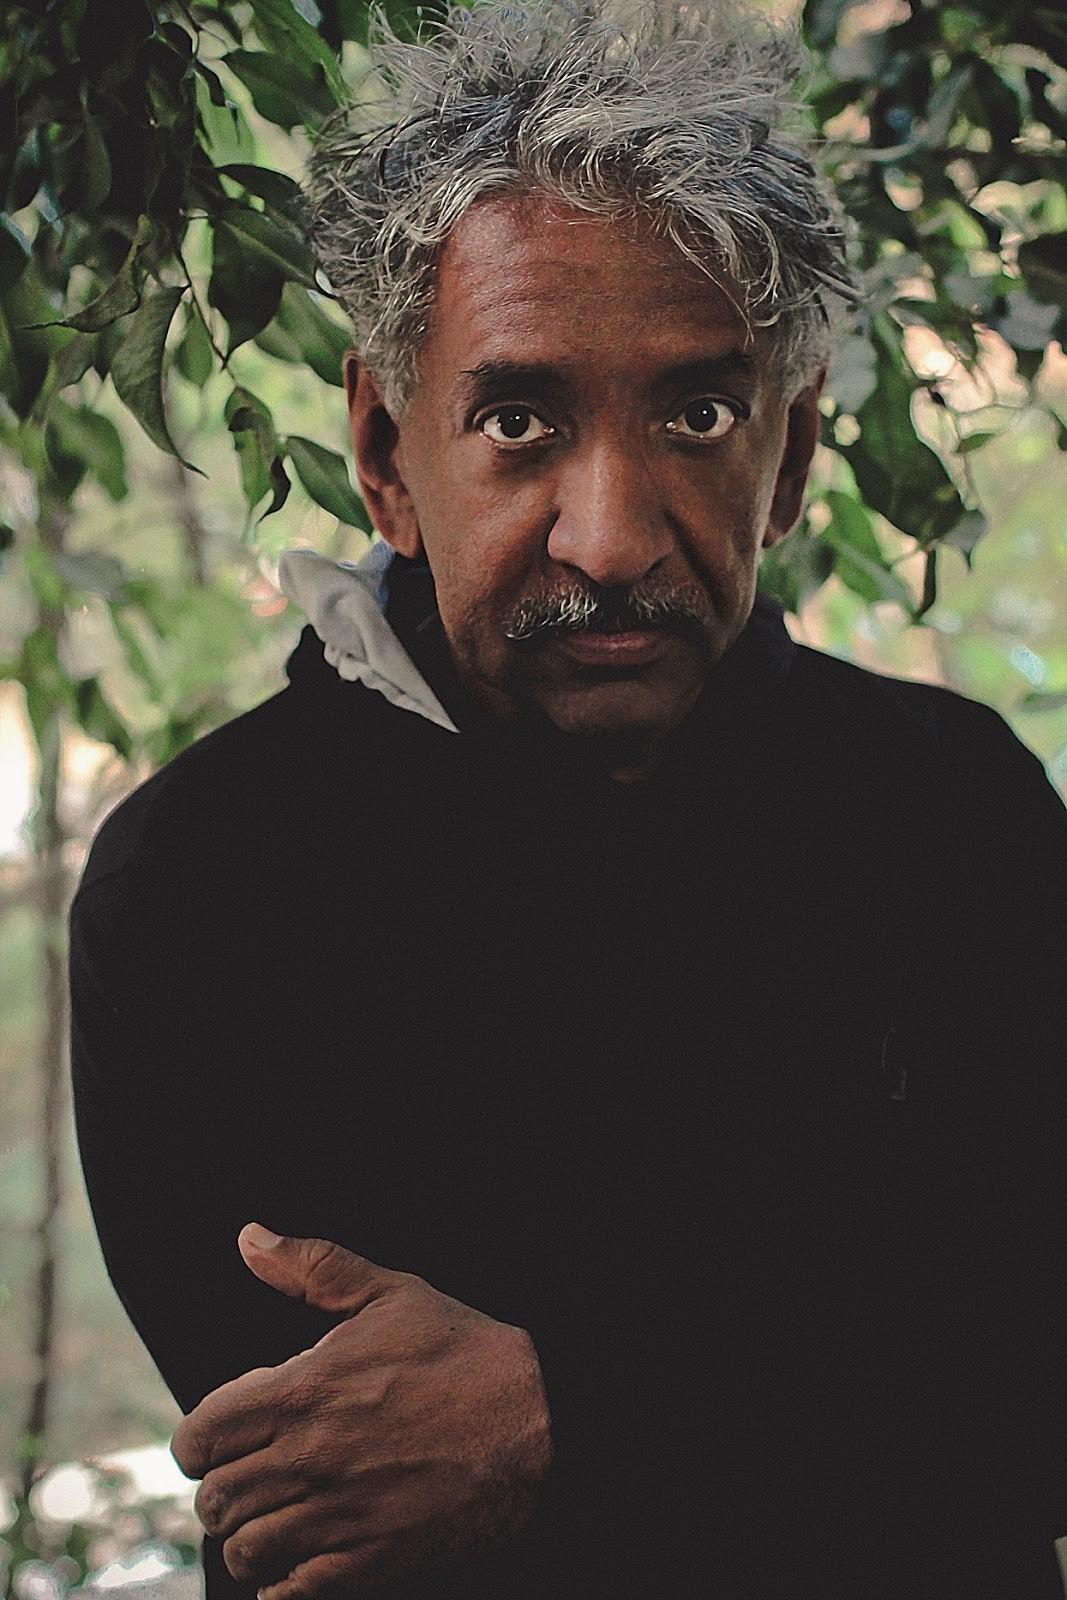 Morre Letieres Leite, artista consagrado pela maestria de unir o jazz ao universo percussivo afro-baiano